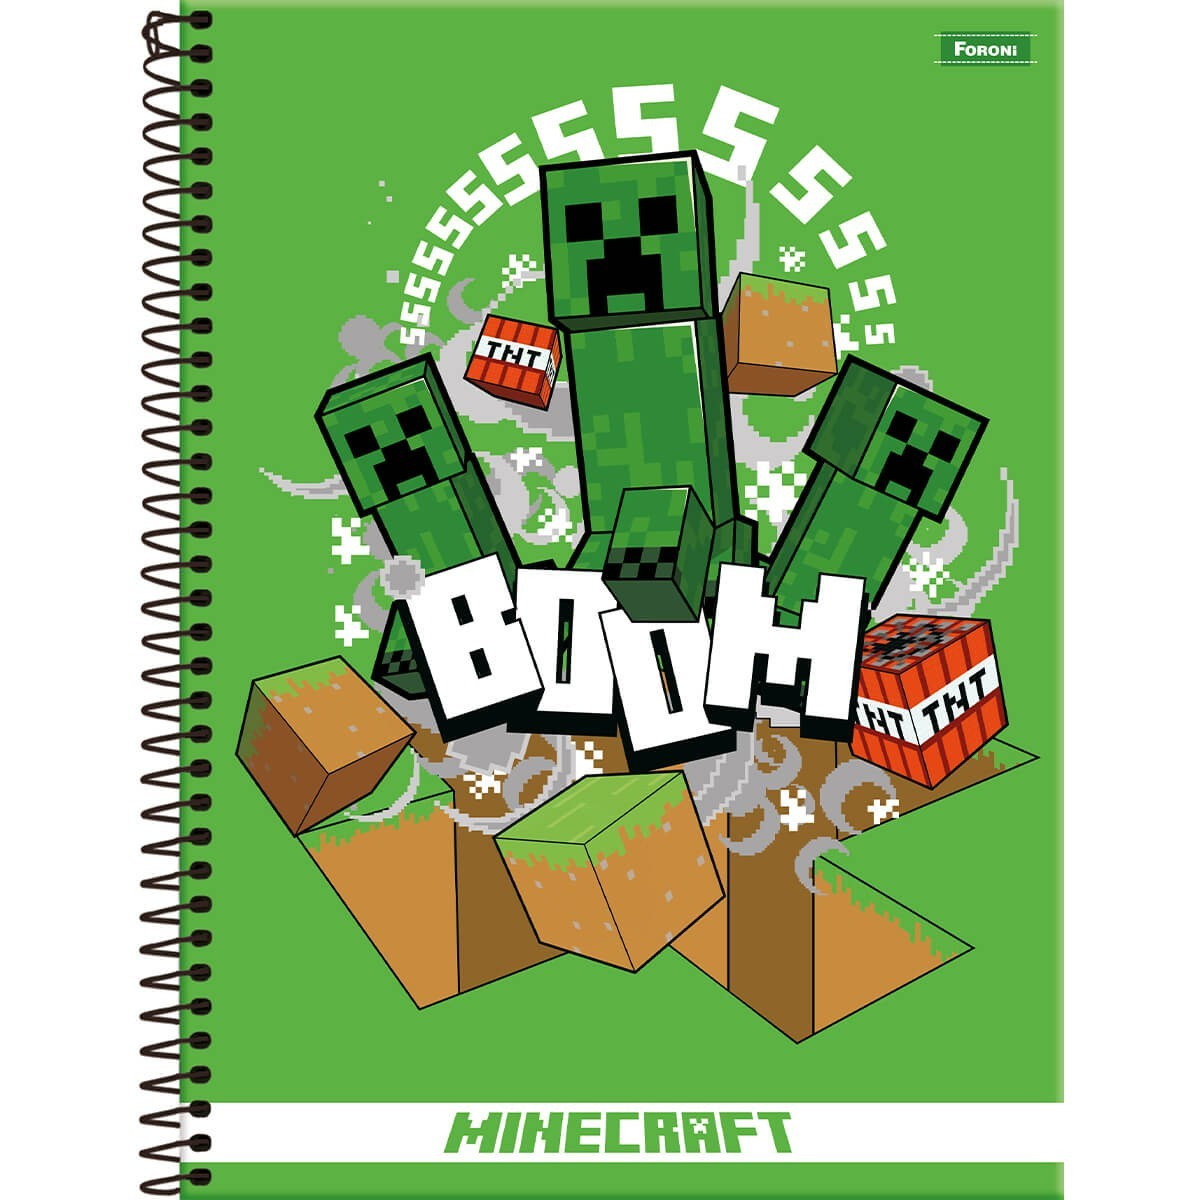 Caderno Universitário 1x1 CD 96 Folhas Minecraft 7 Foroni